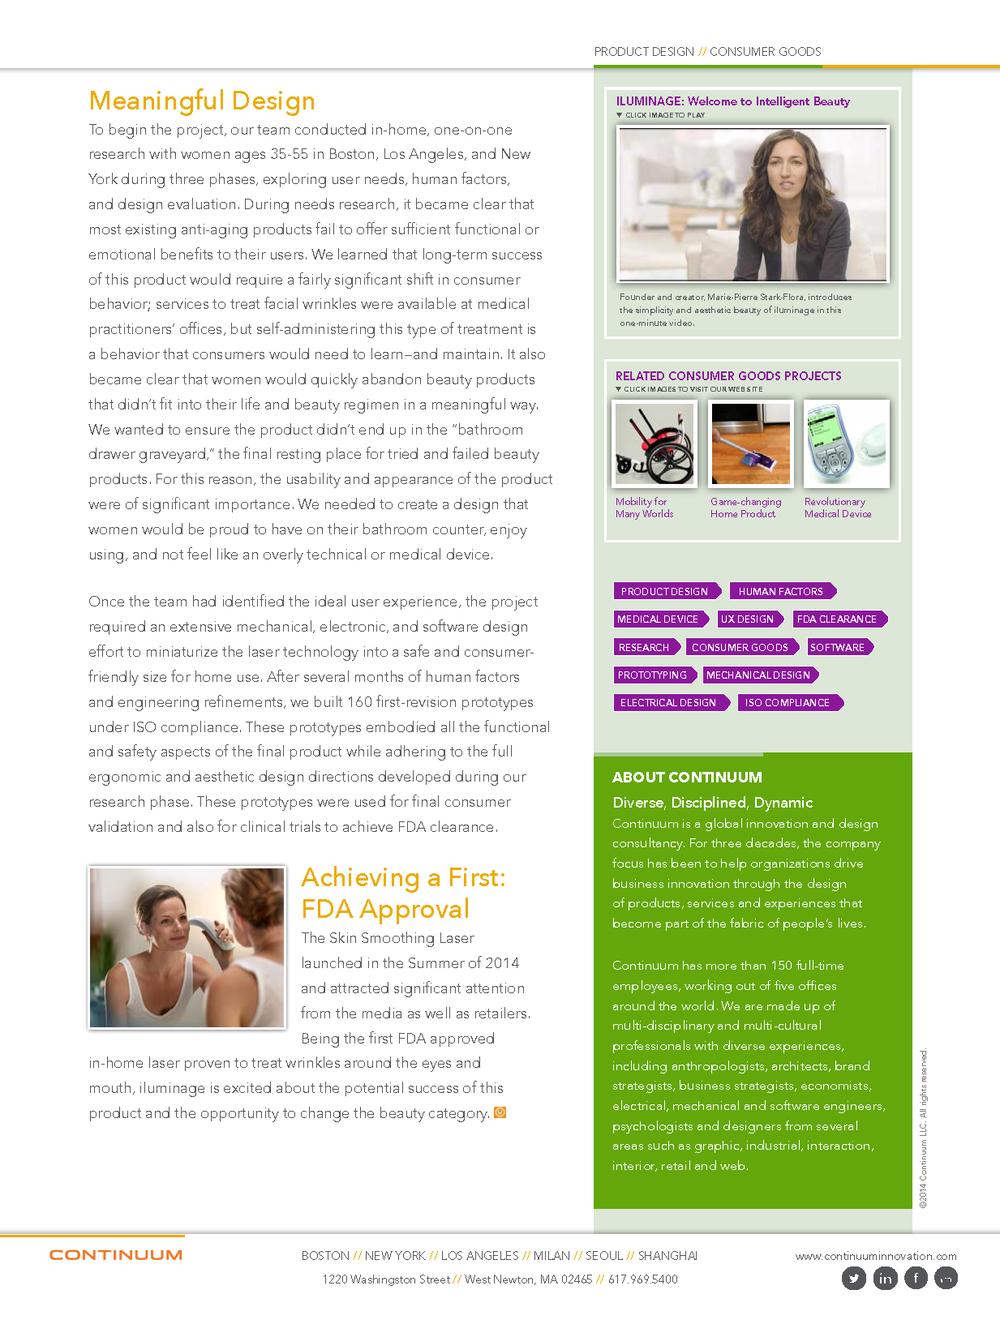 Continuum_iluminageSheet_v2-Interactive_Page_2.png